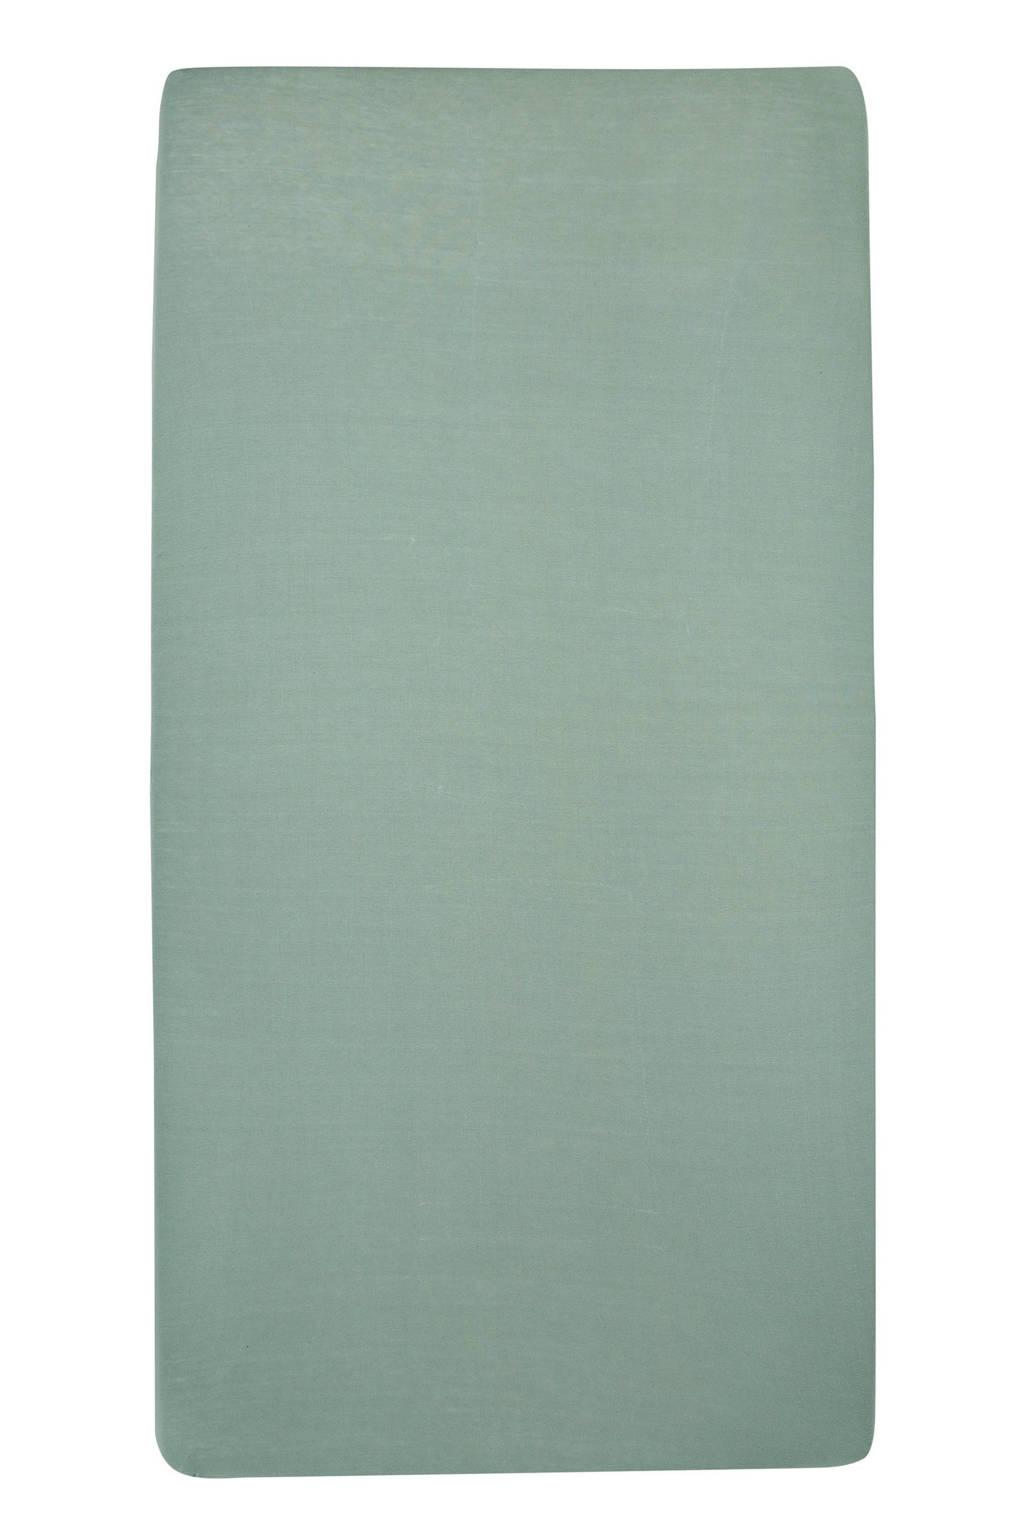 Meyco katoenen hoeslaken wieg 40x80/90 cm (set van 2) Stone green, Stone Green